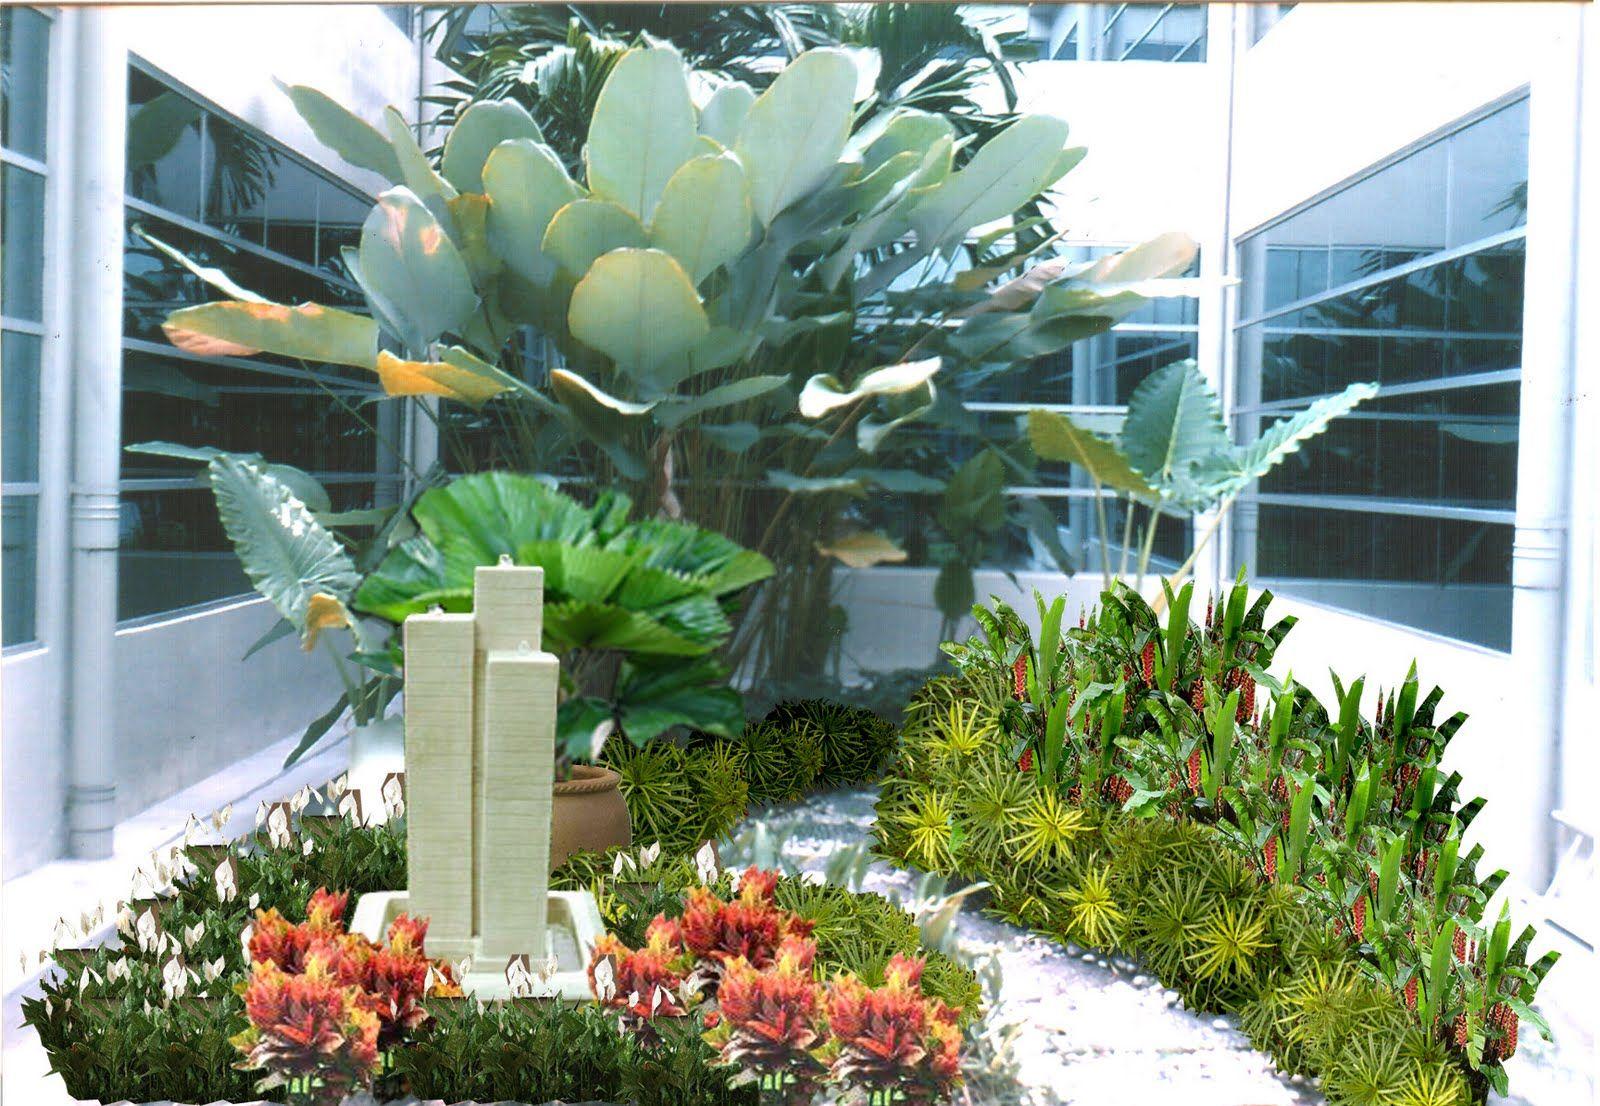 We have been providing interior landscape design services since